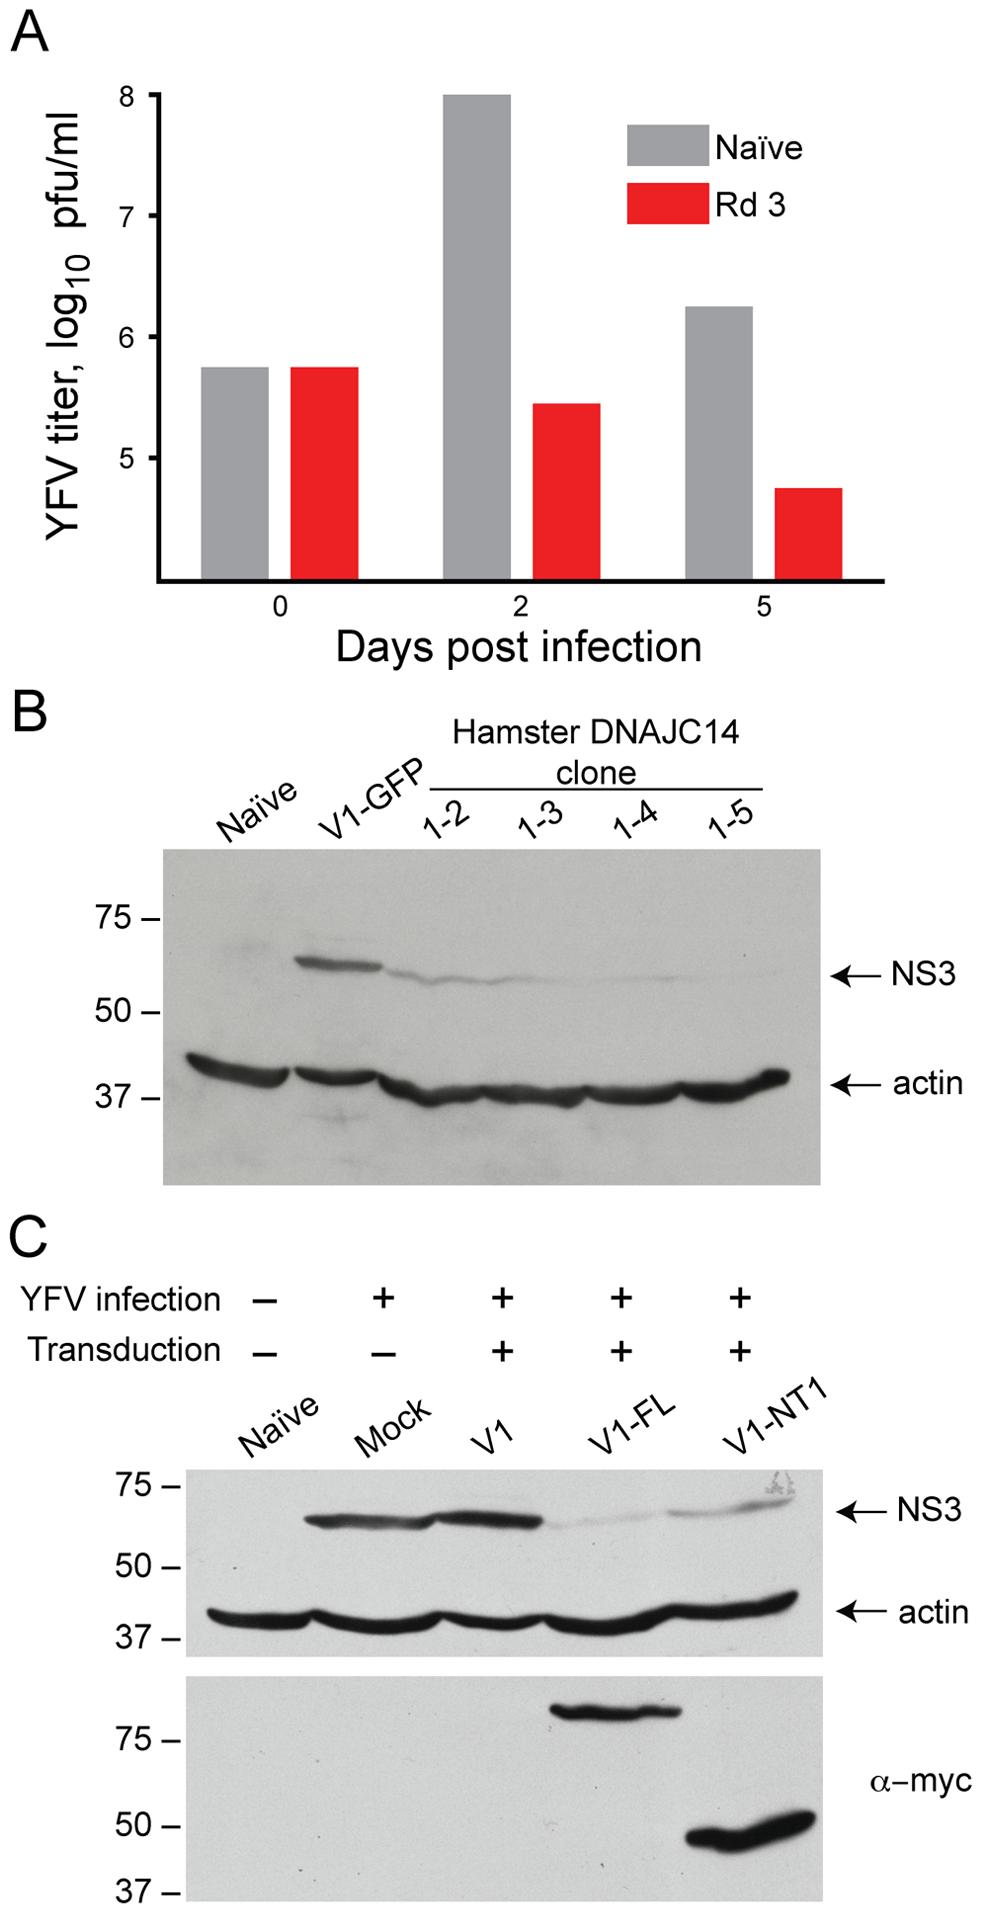 DNAJC14 inhibits YFV replication.